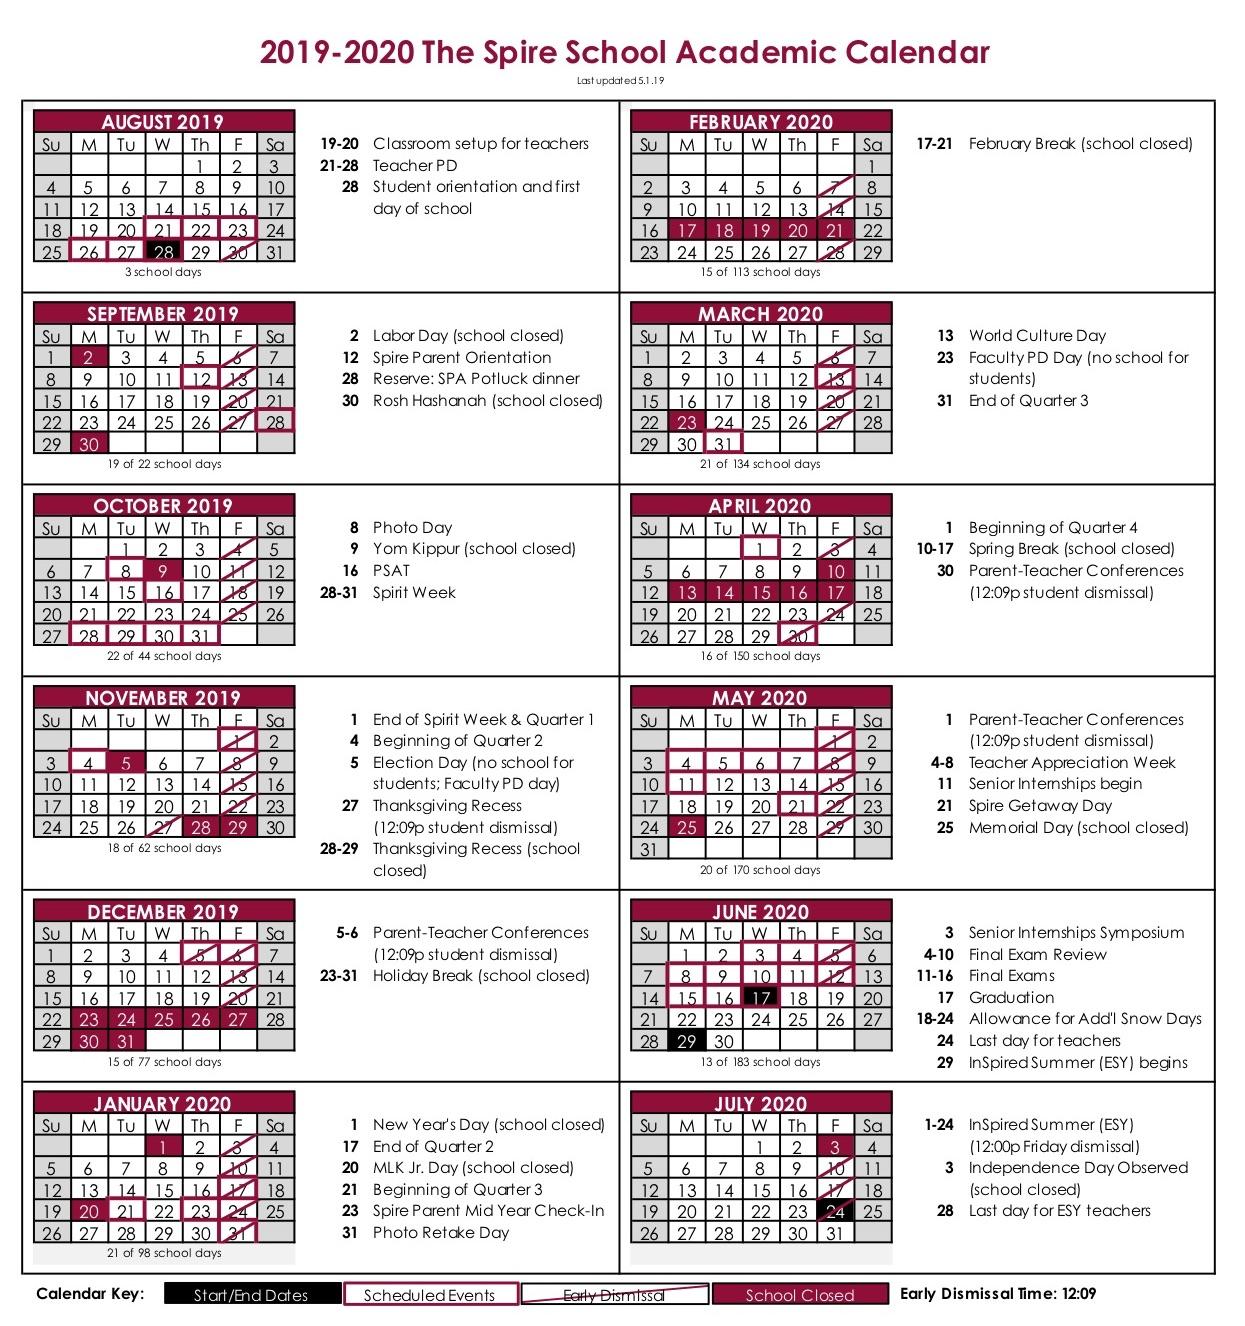 Spire 2019-20 School Calendar6.1.19.jpg